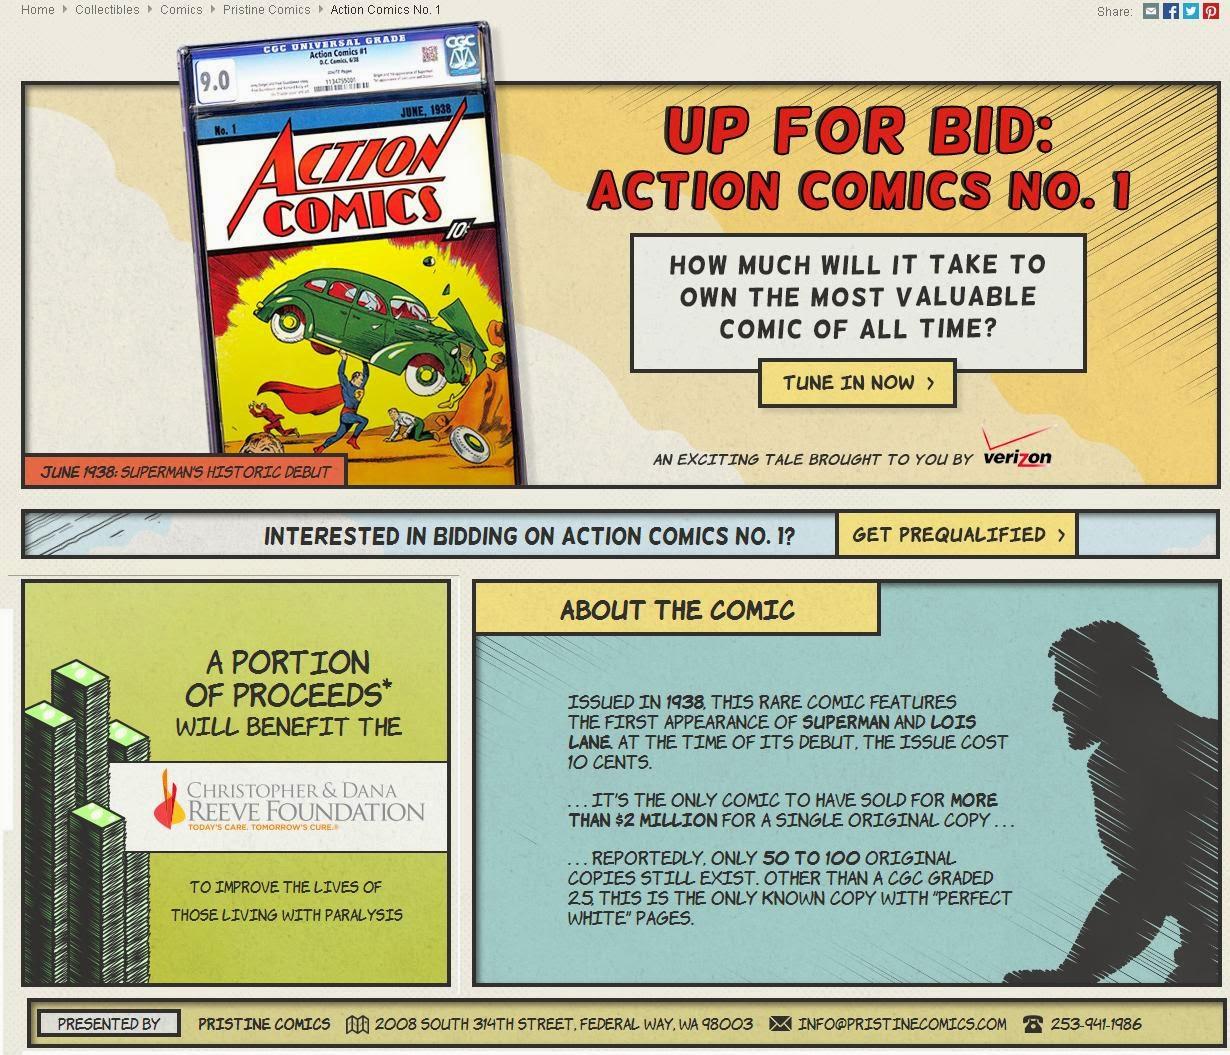 http://cc.ebay.com/action-comics/?_trkparms=clkid%3D17121932510558432